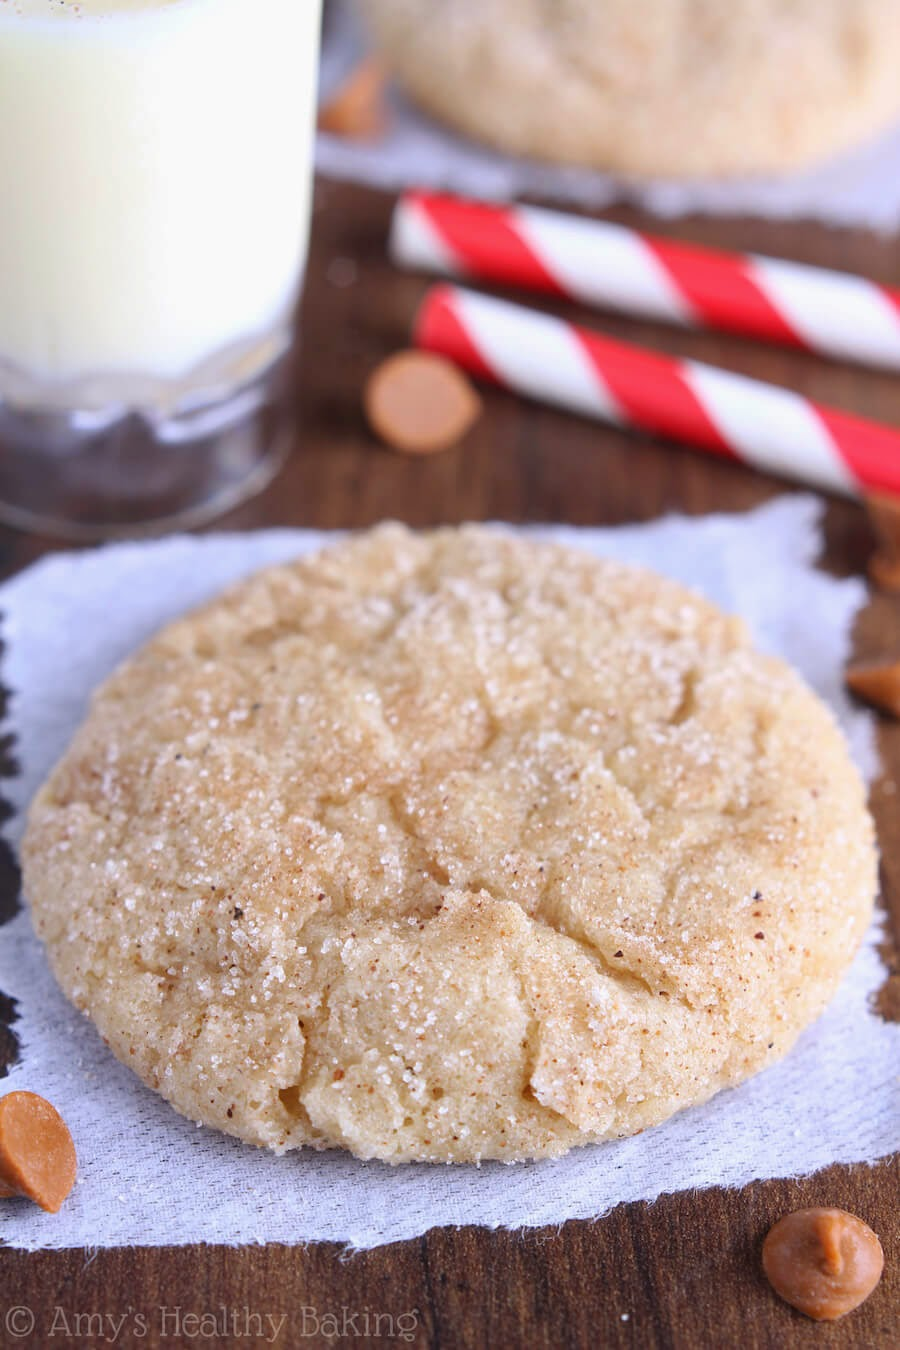 Eggnog Snickerdoodles, Amy's Healthy Baking, 106 calories